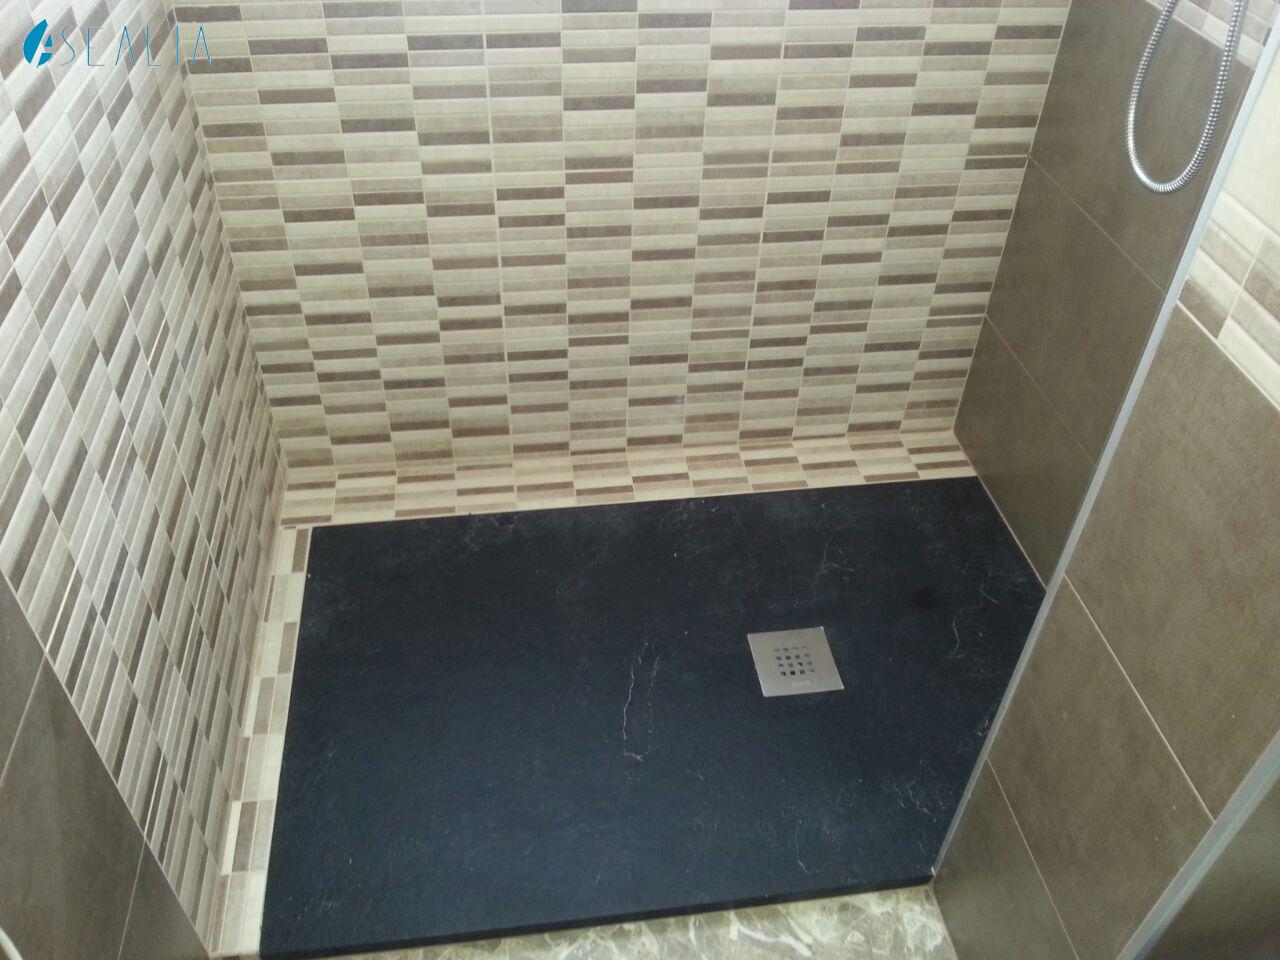 Sorteo asealia mueble auxiliar de ba o blog tienda for Plato de decoracion marroqui salon 2014